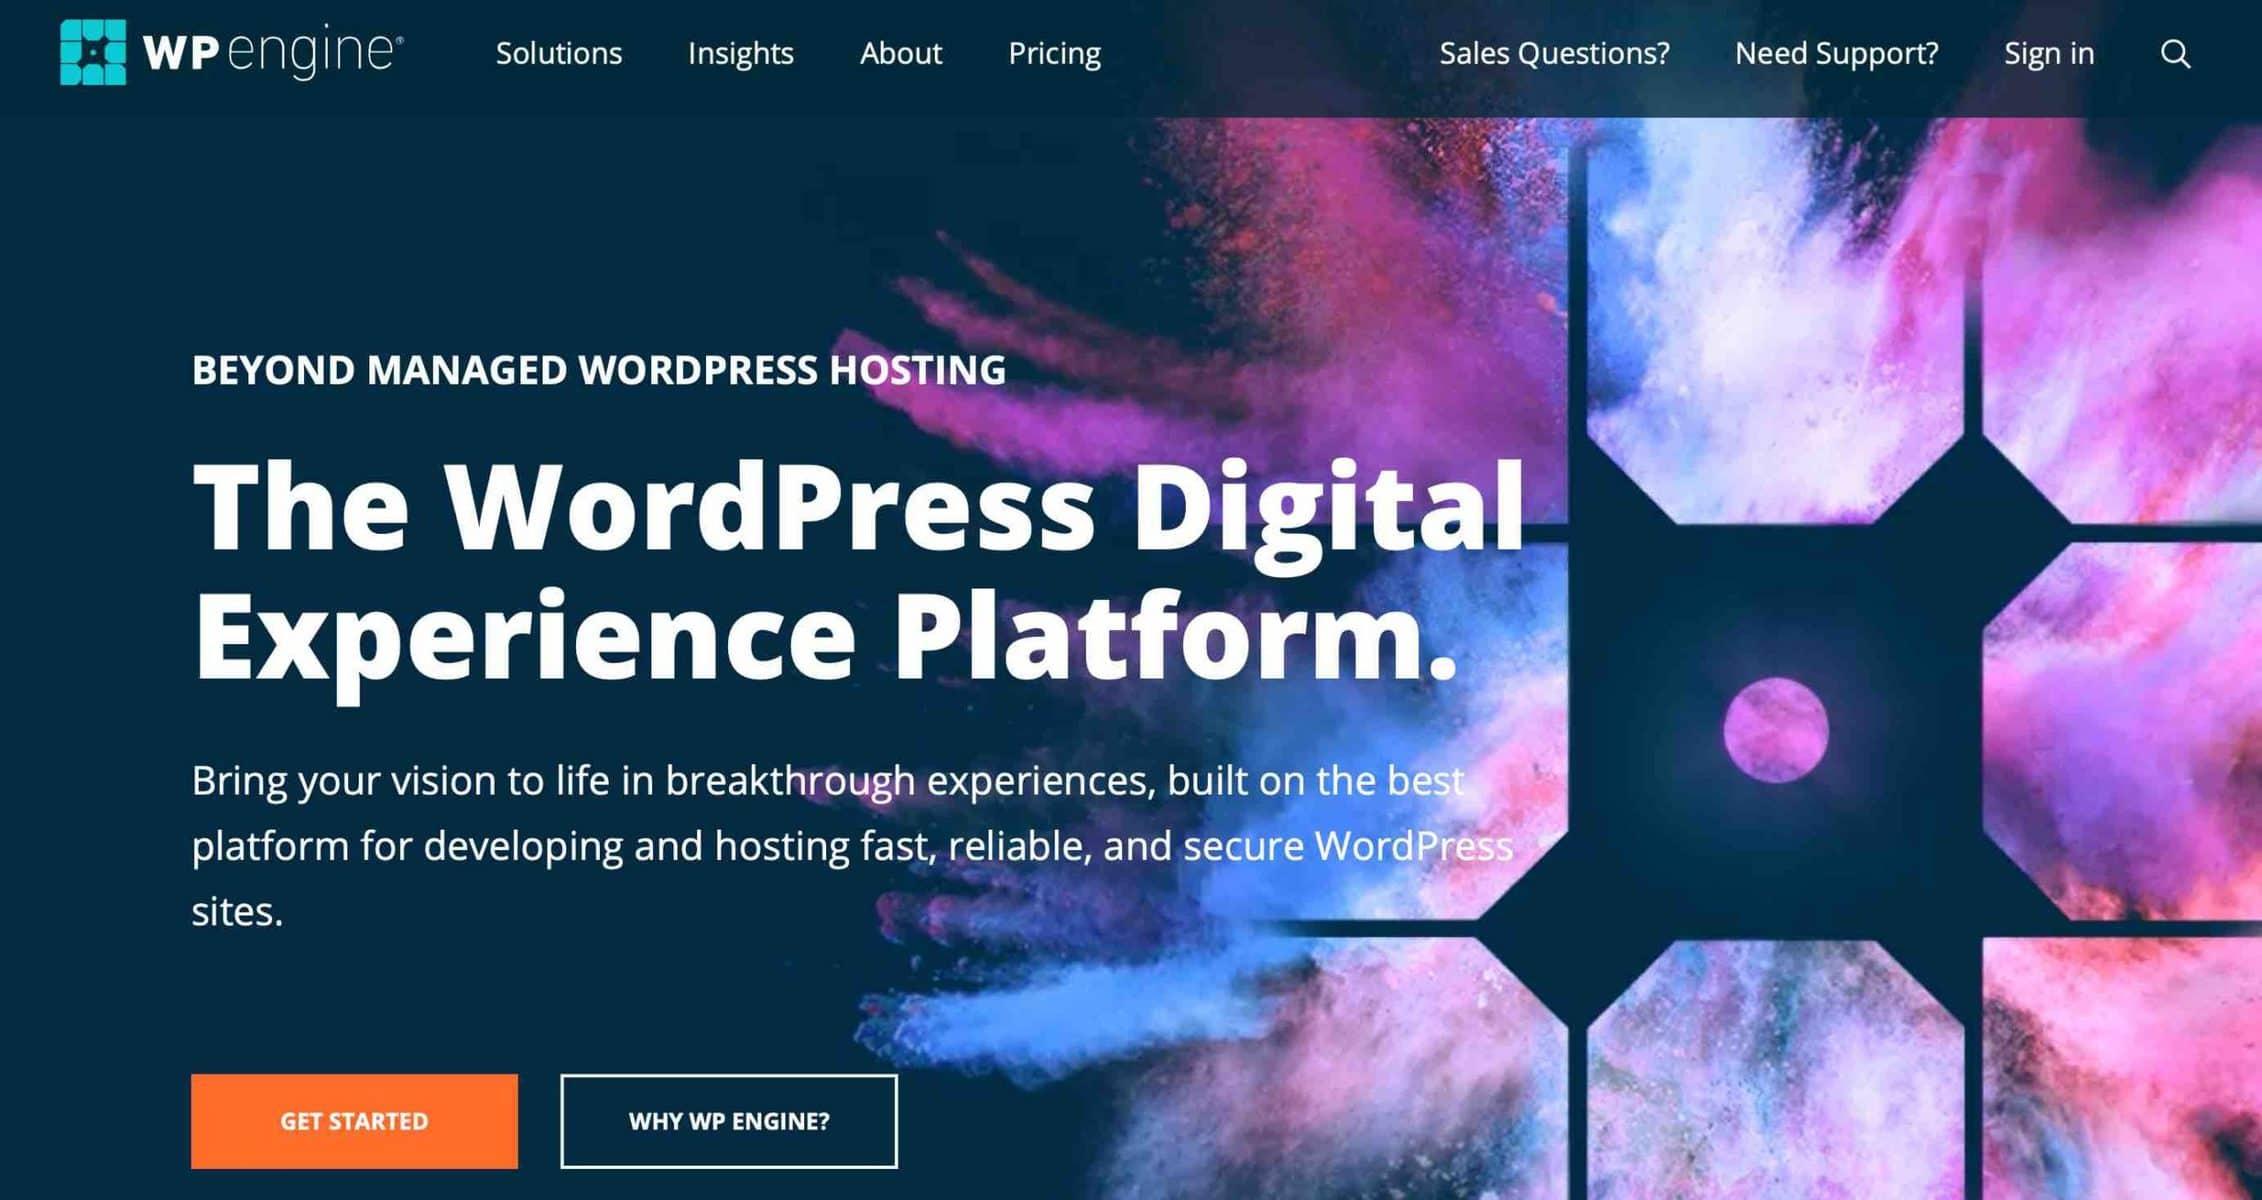 The WordPress Digital Experience Platform